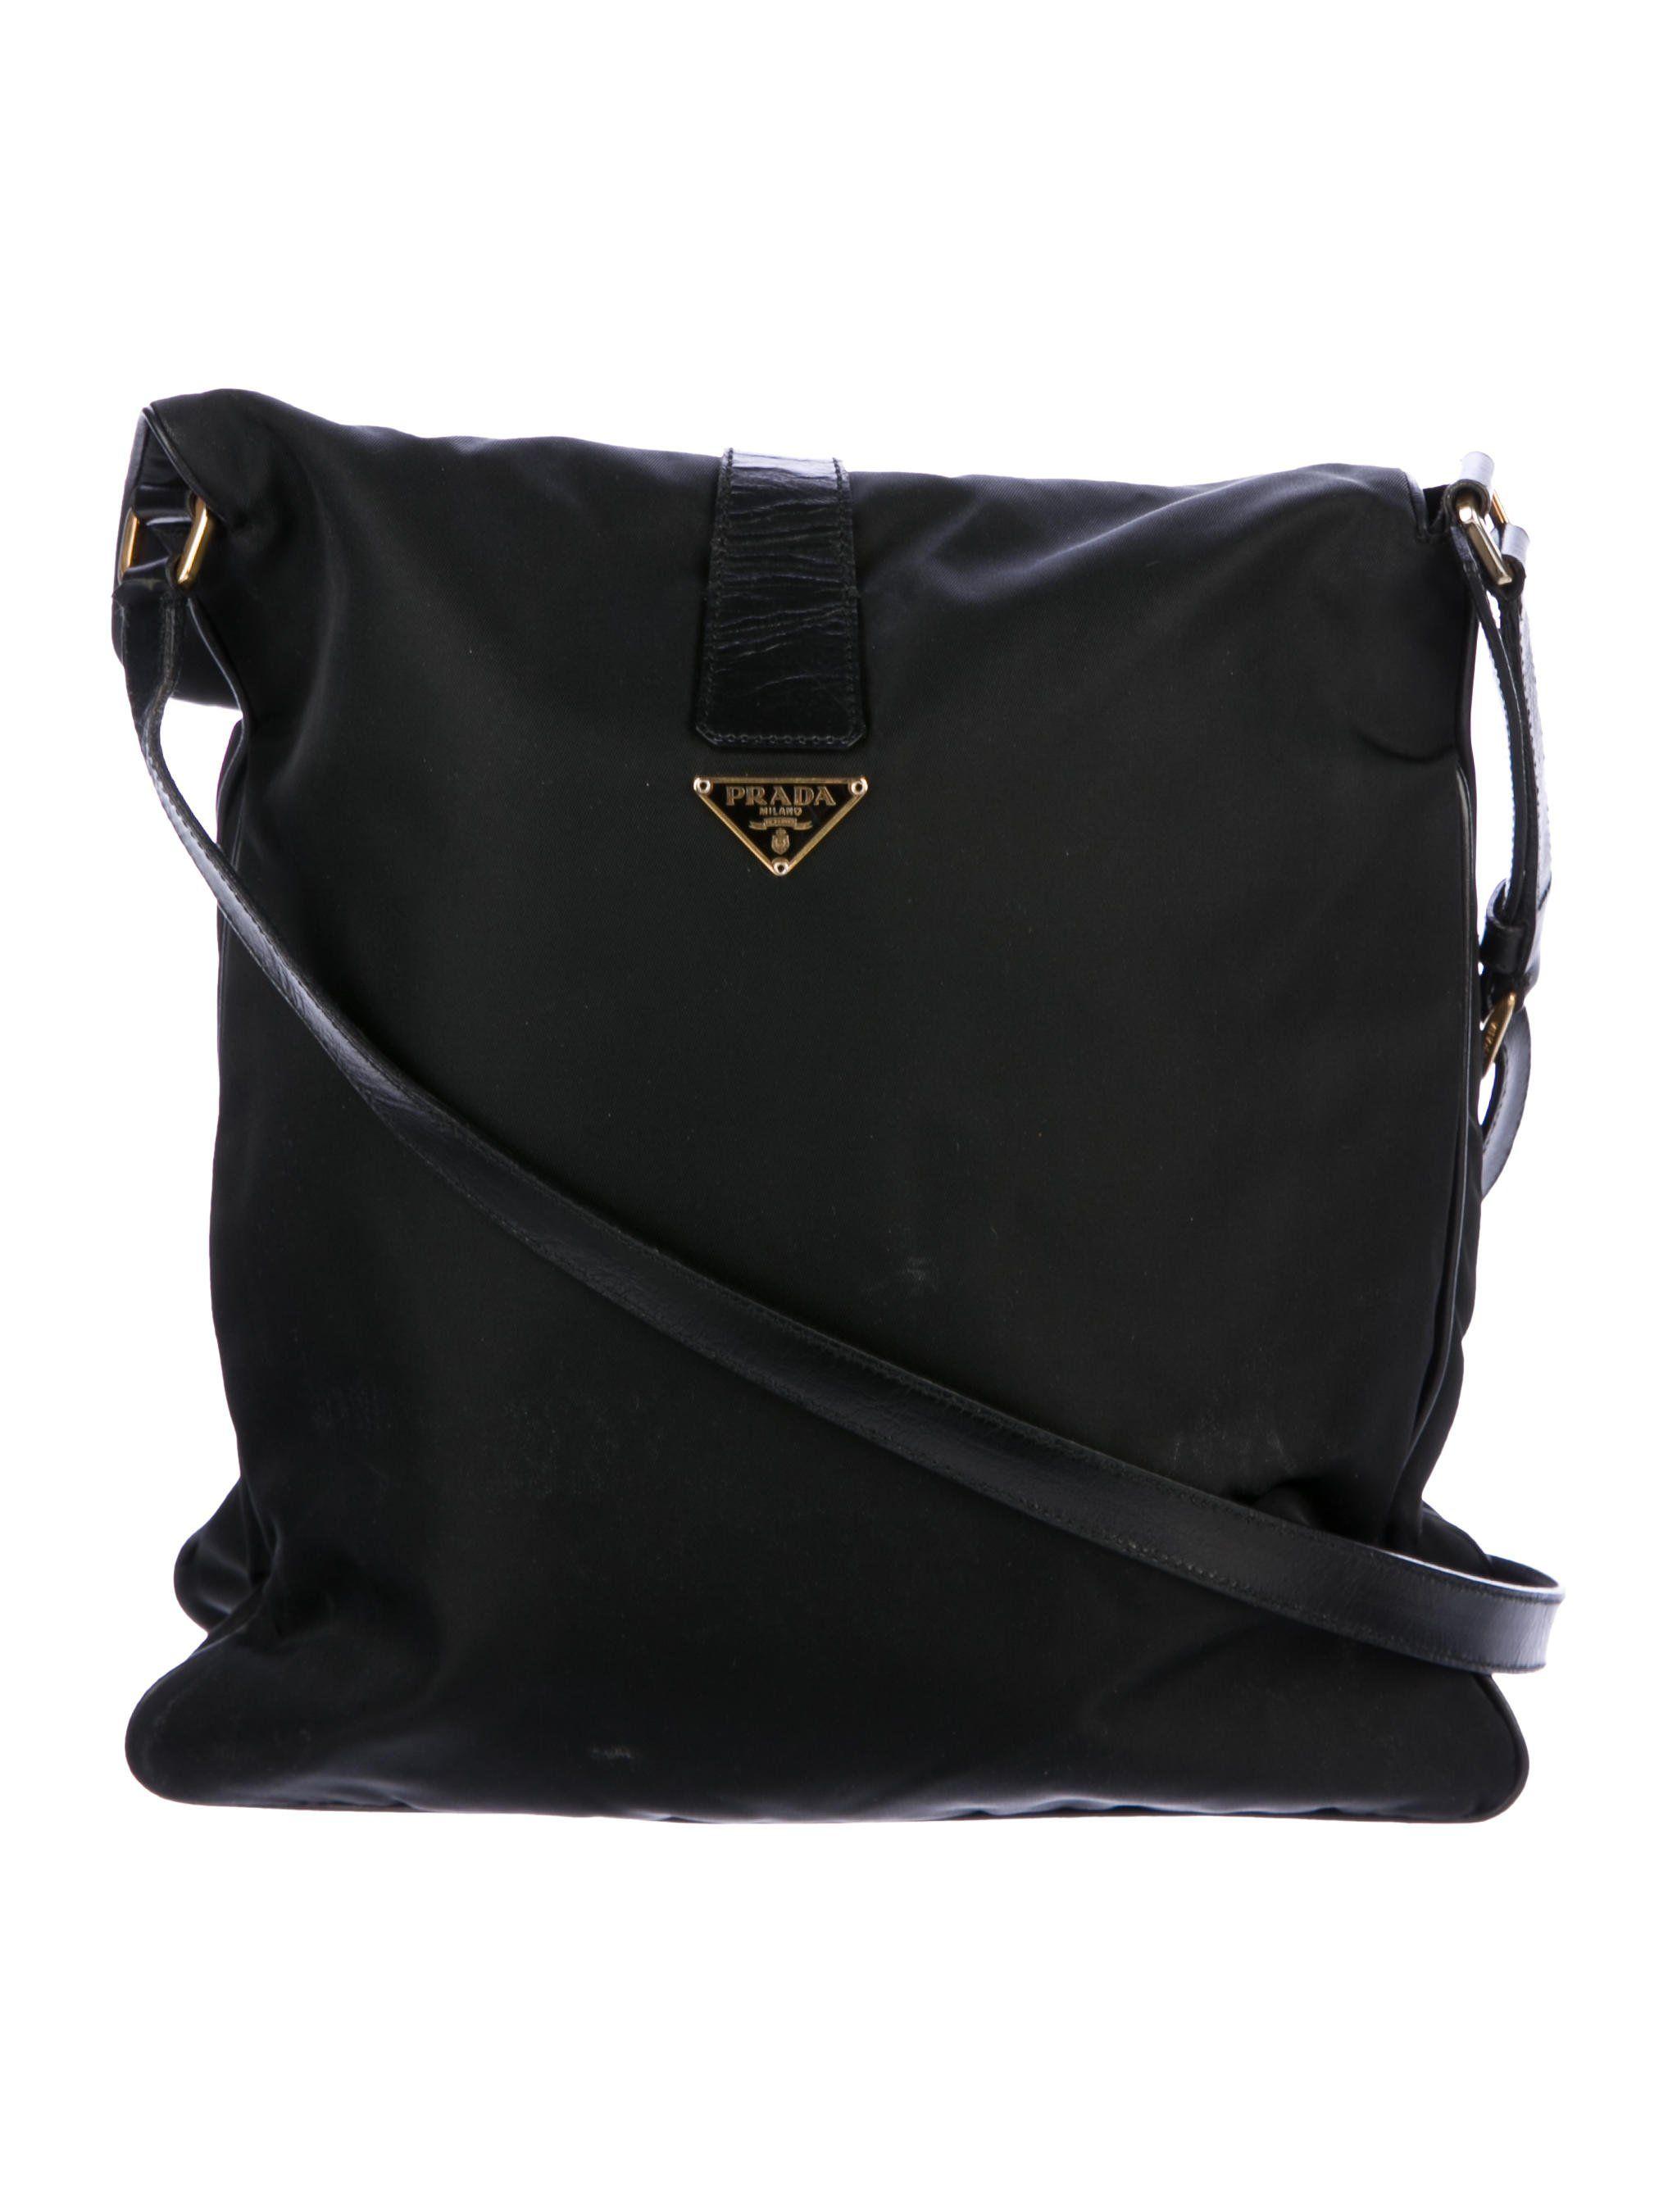 2bd12a3d7882 Black Tessuto nylon Prada shoulder bag with gold-tone hardware